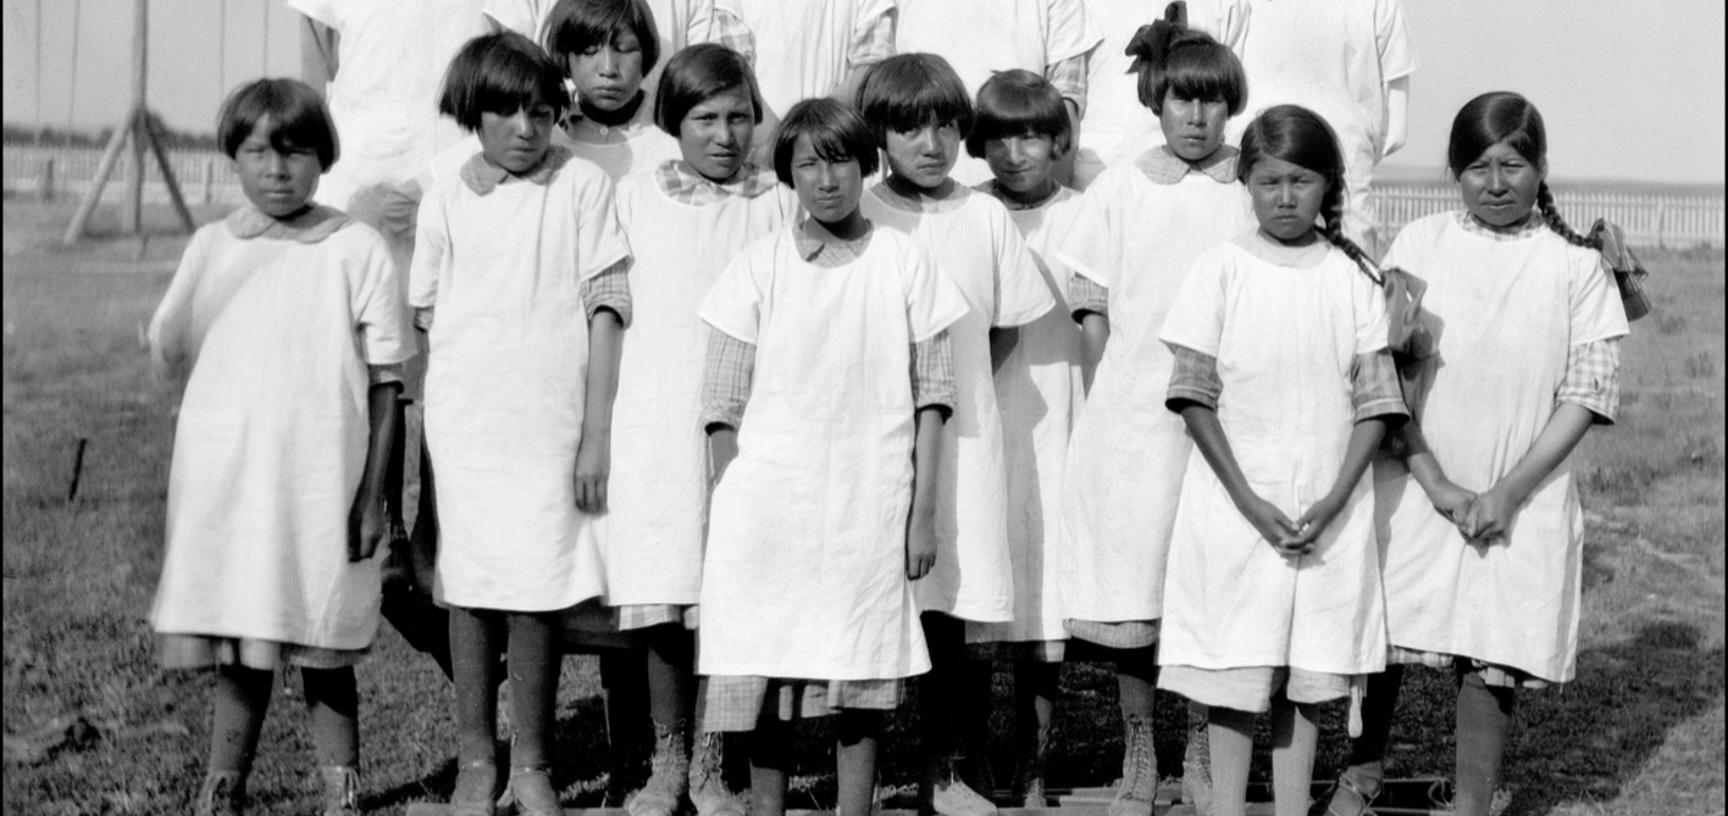 Kainai (Blackfoot) girls, St. Mary's residential school, Alberta, Canada, 1925. [1998.442.82]